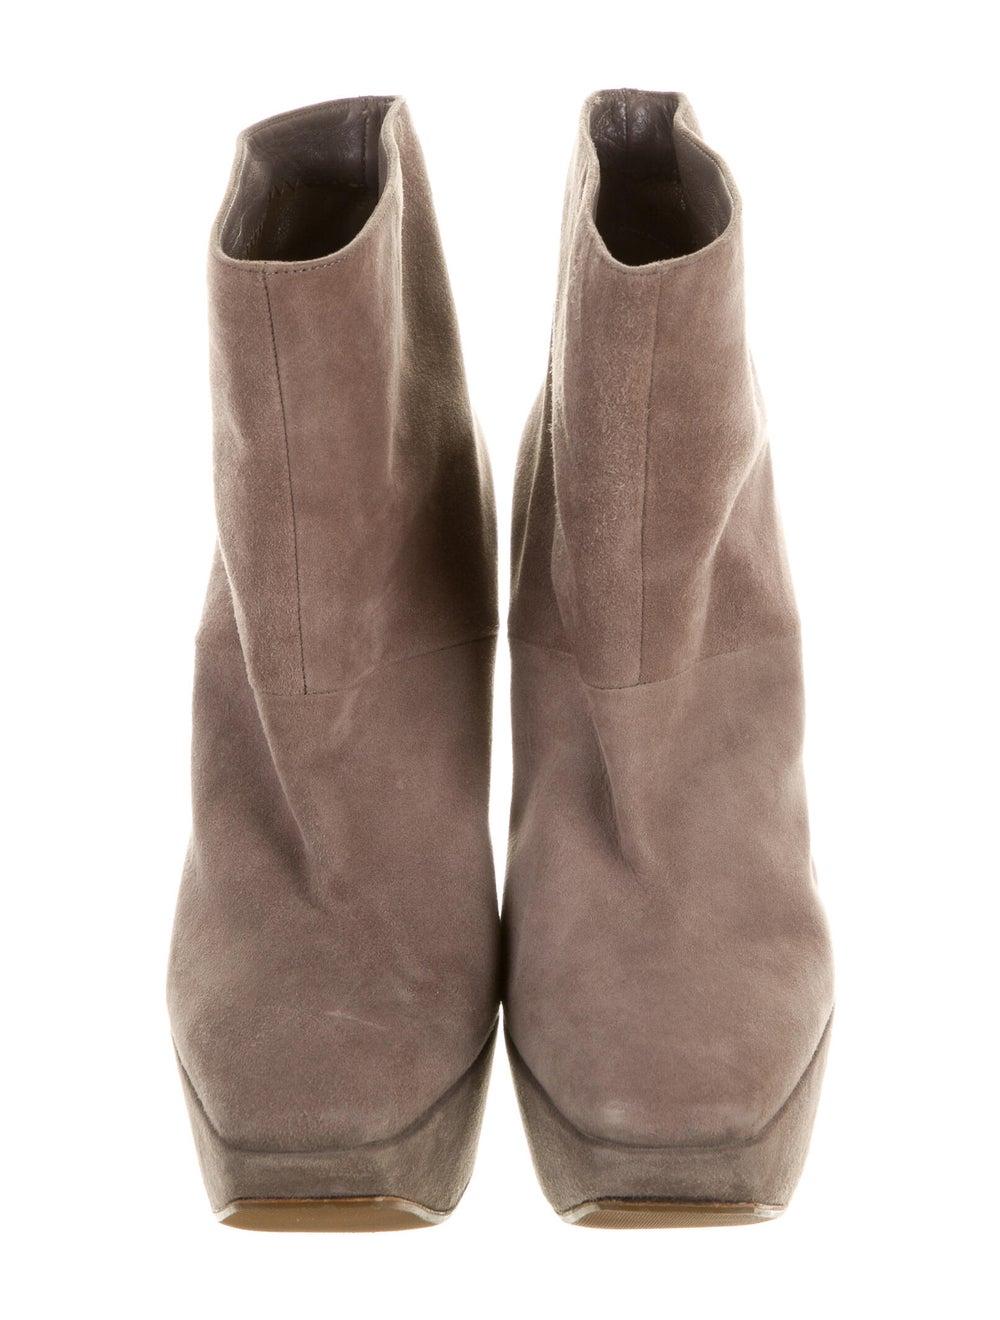 Marni Boots - image 3